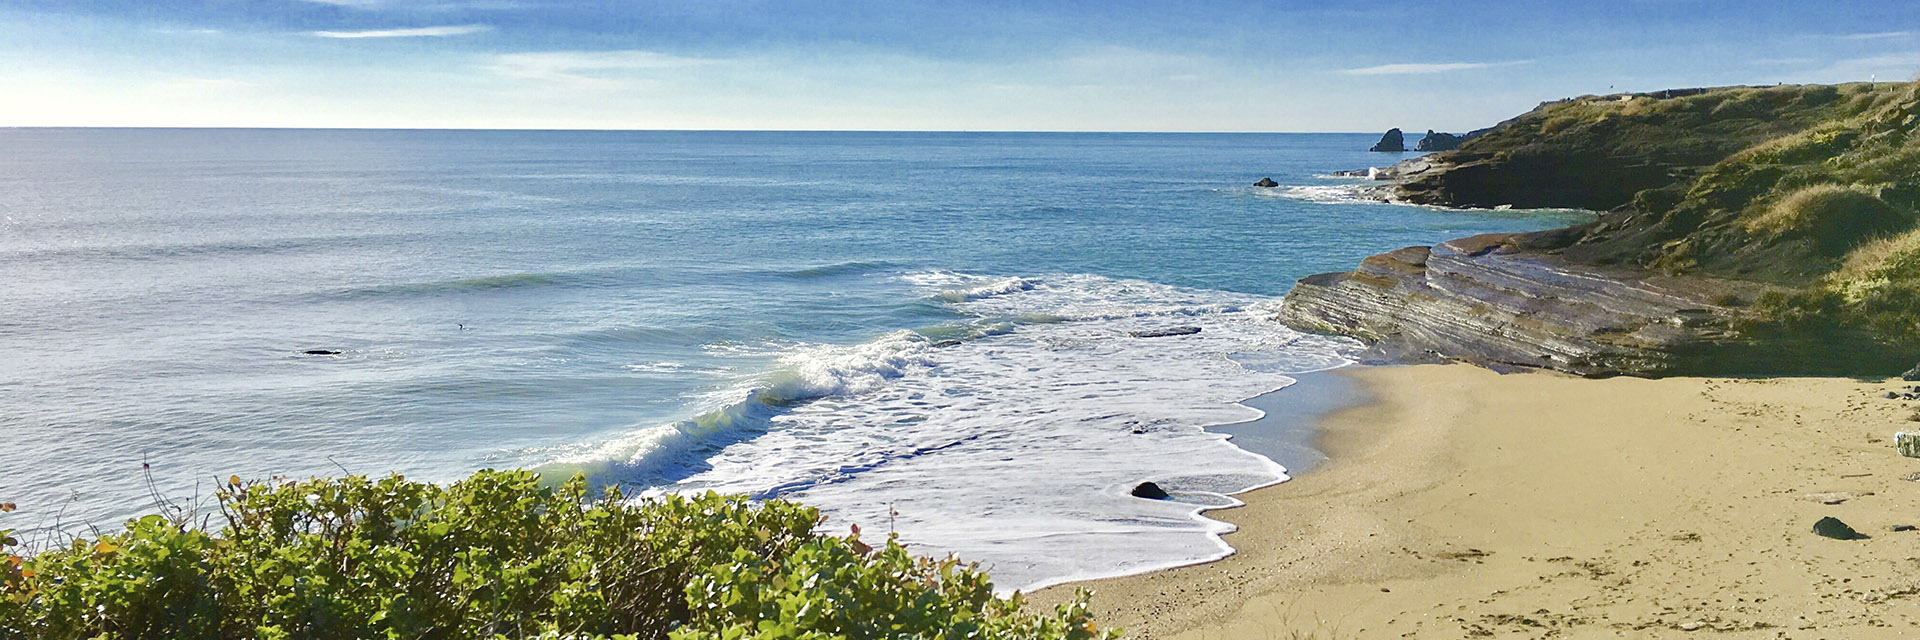 village-vacance-batipaume-plage